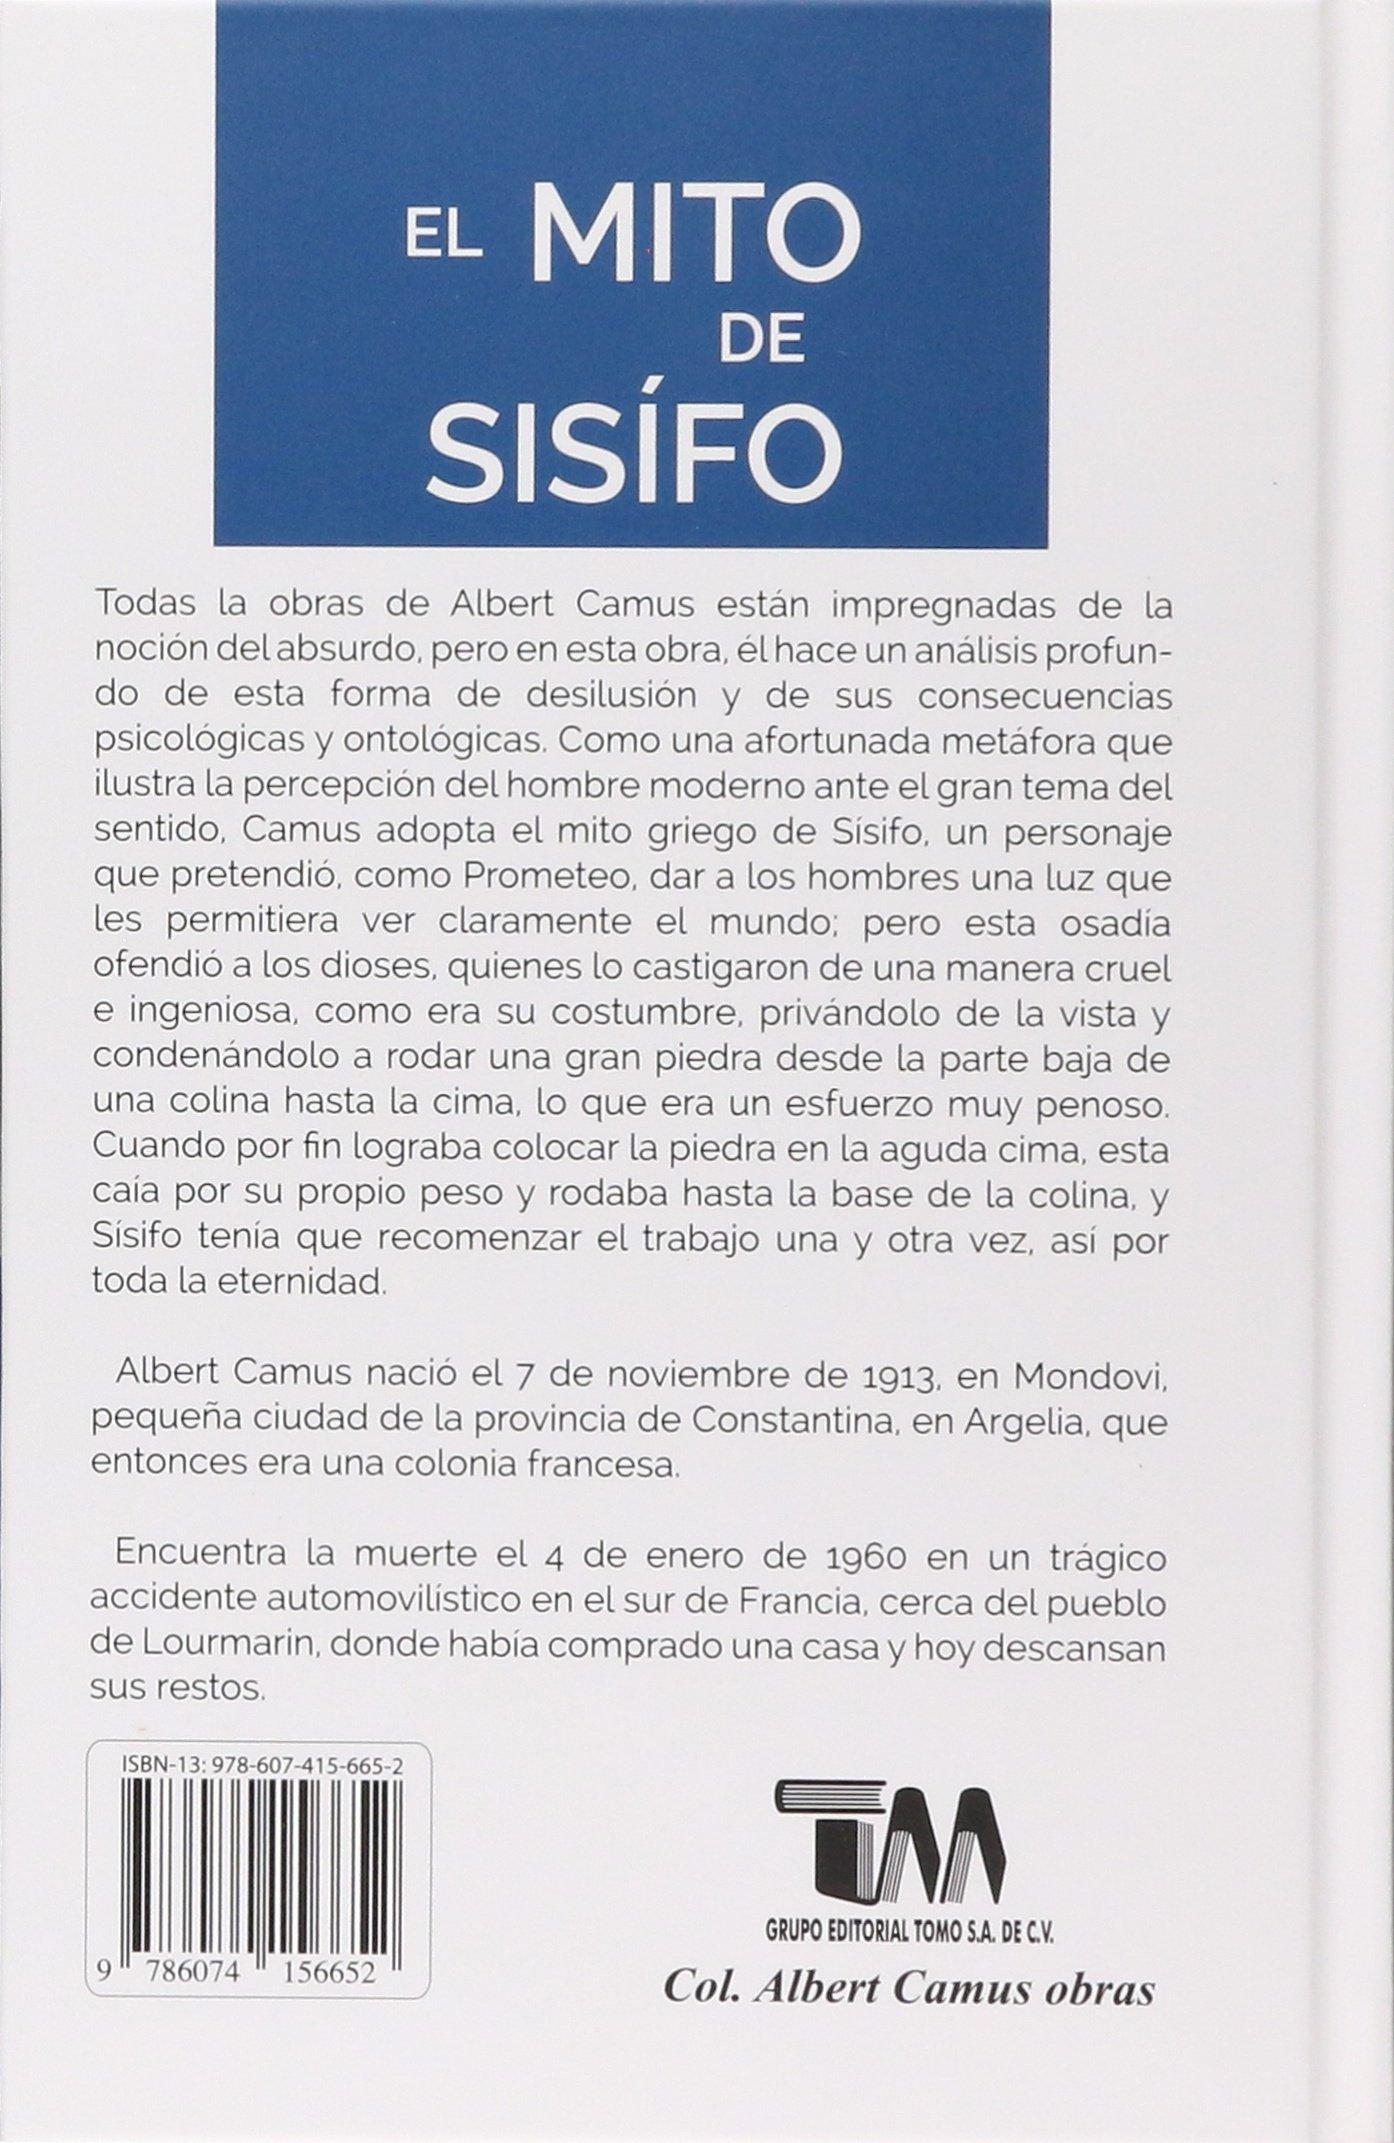 Amazon.com: Mito de Sisifo, El (English and Spanish Edition ...